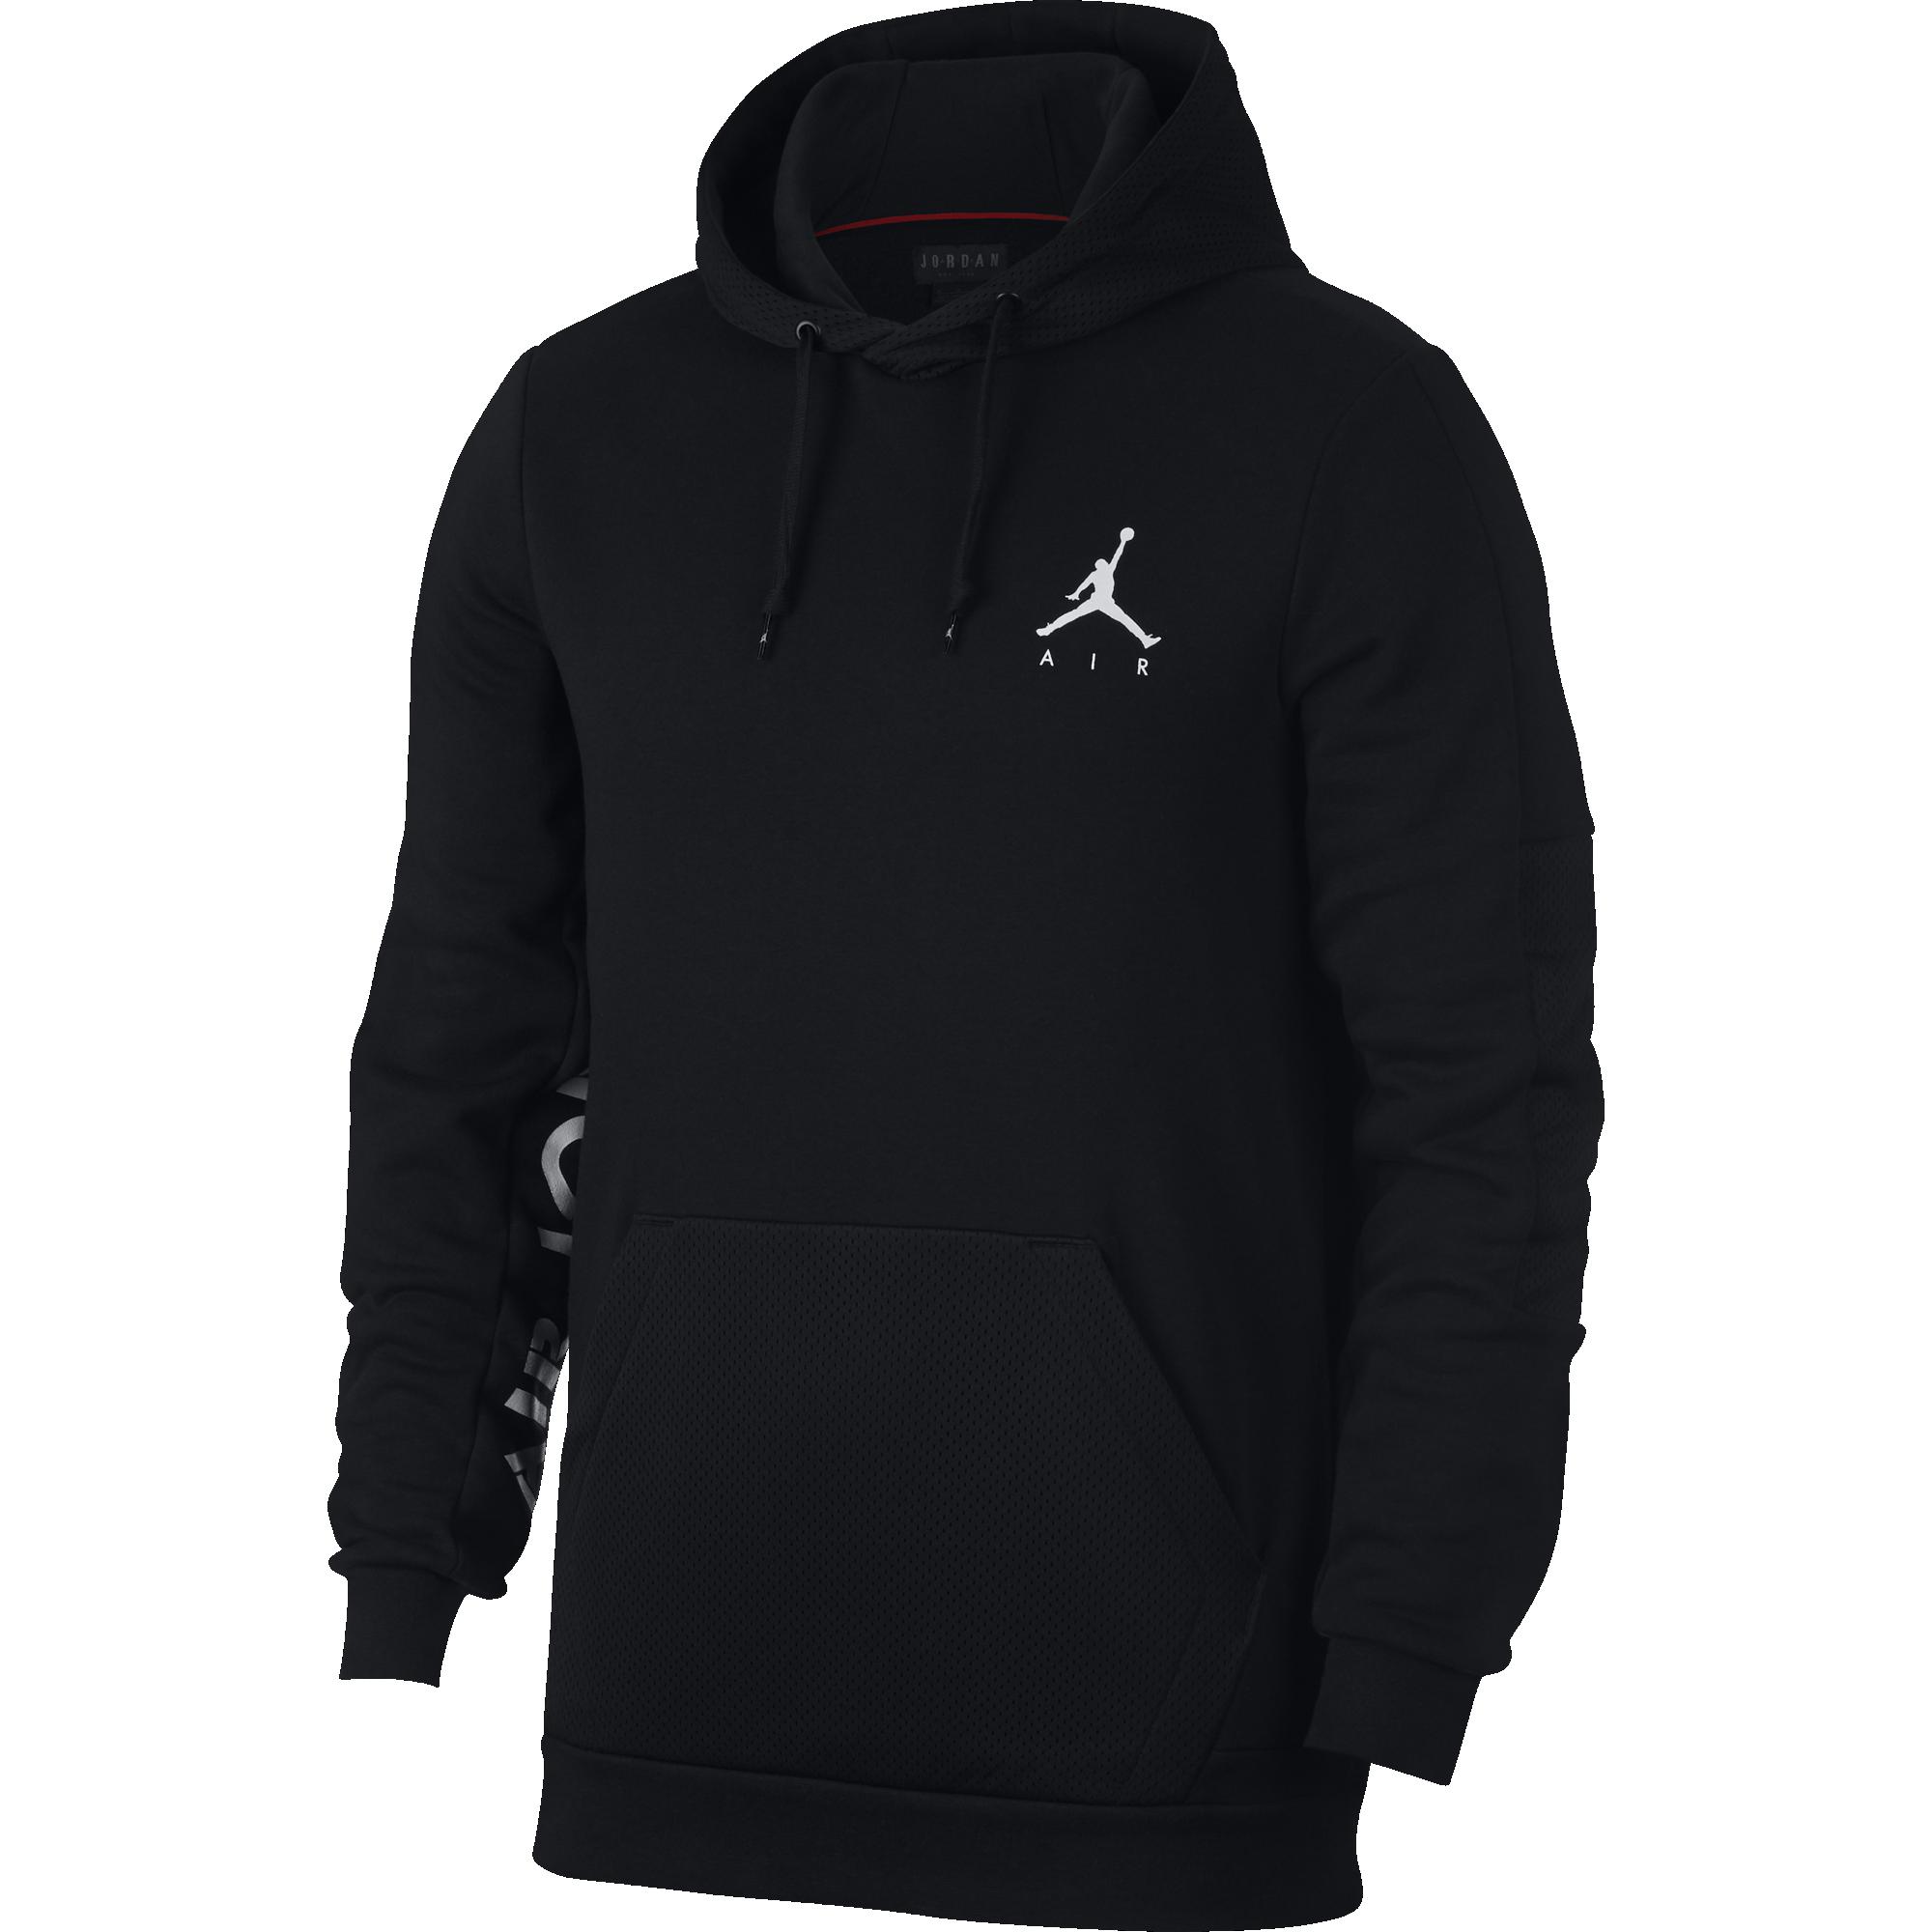 Nike Jordan Sportswear Jumpman Air Camo Fleece Pull On Hoodie